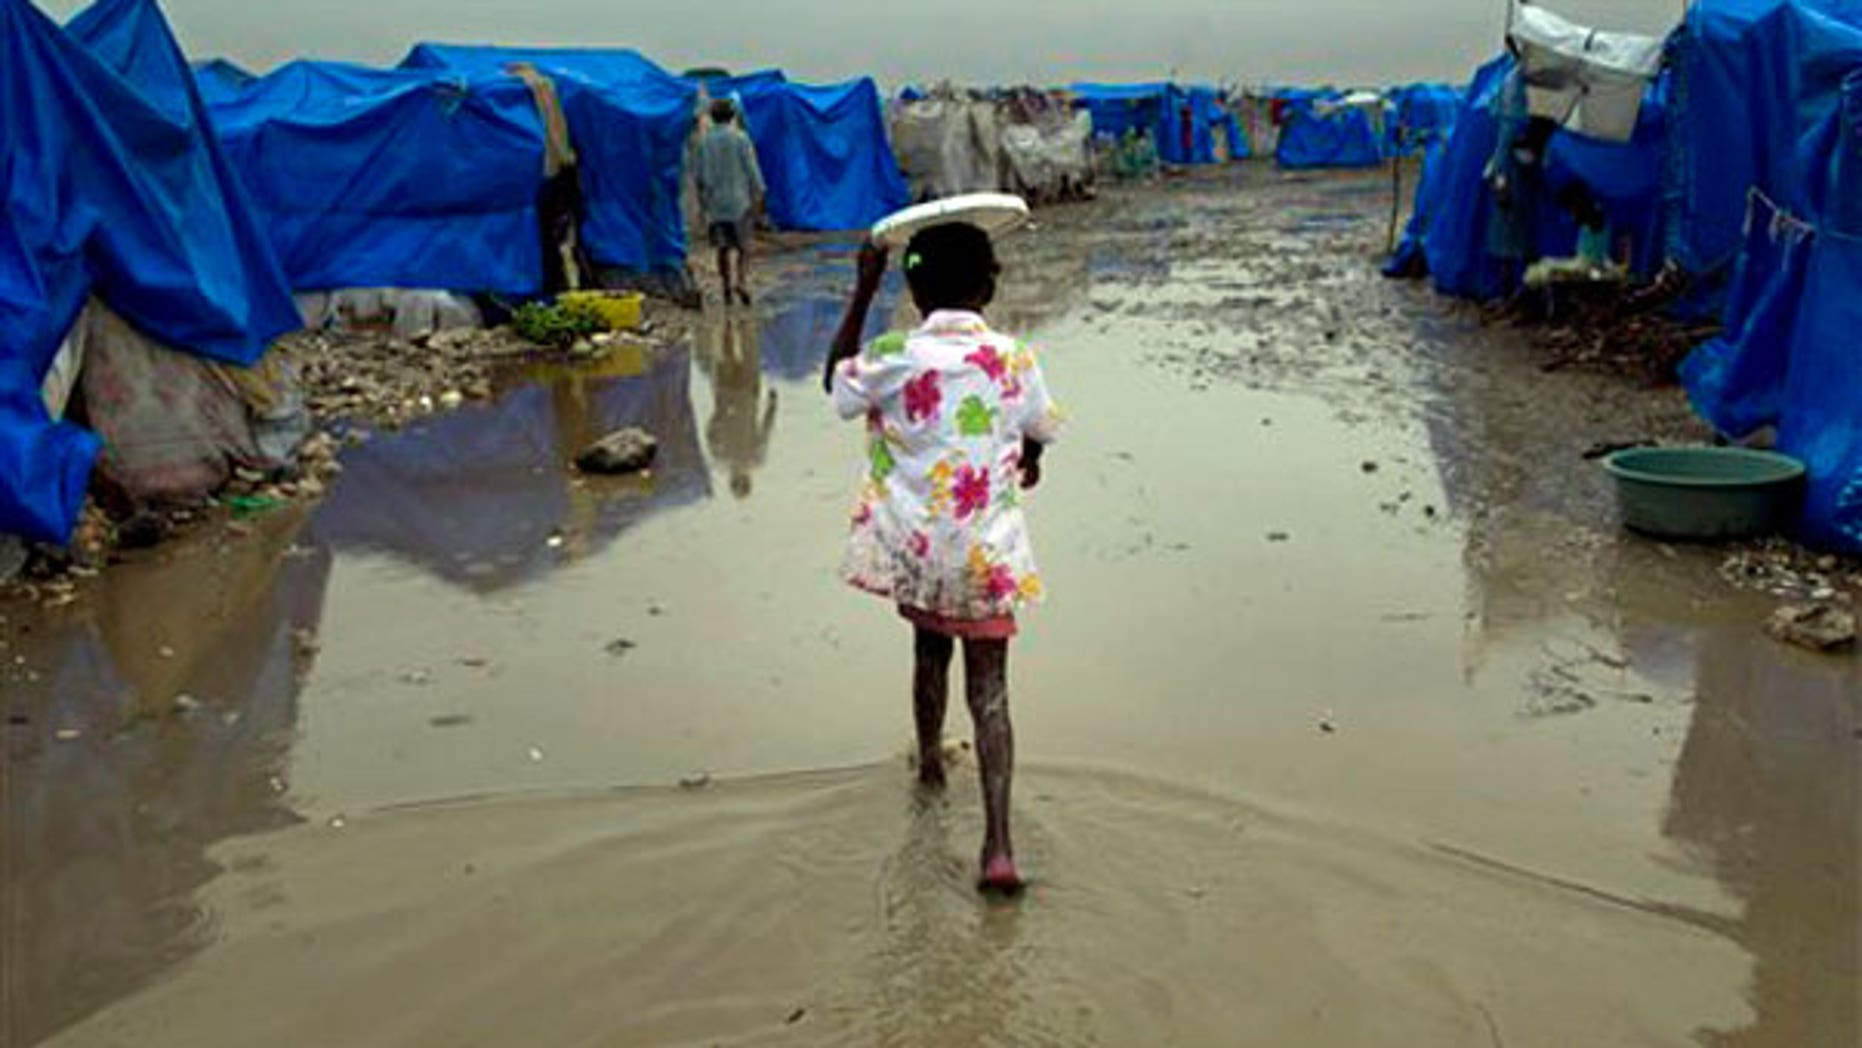 March 19: A girl walks at a homeless earthquake survivors camp during heavy rains in Port-au-Prince, Haiti.